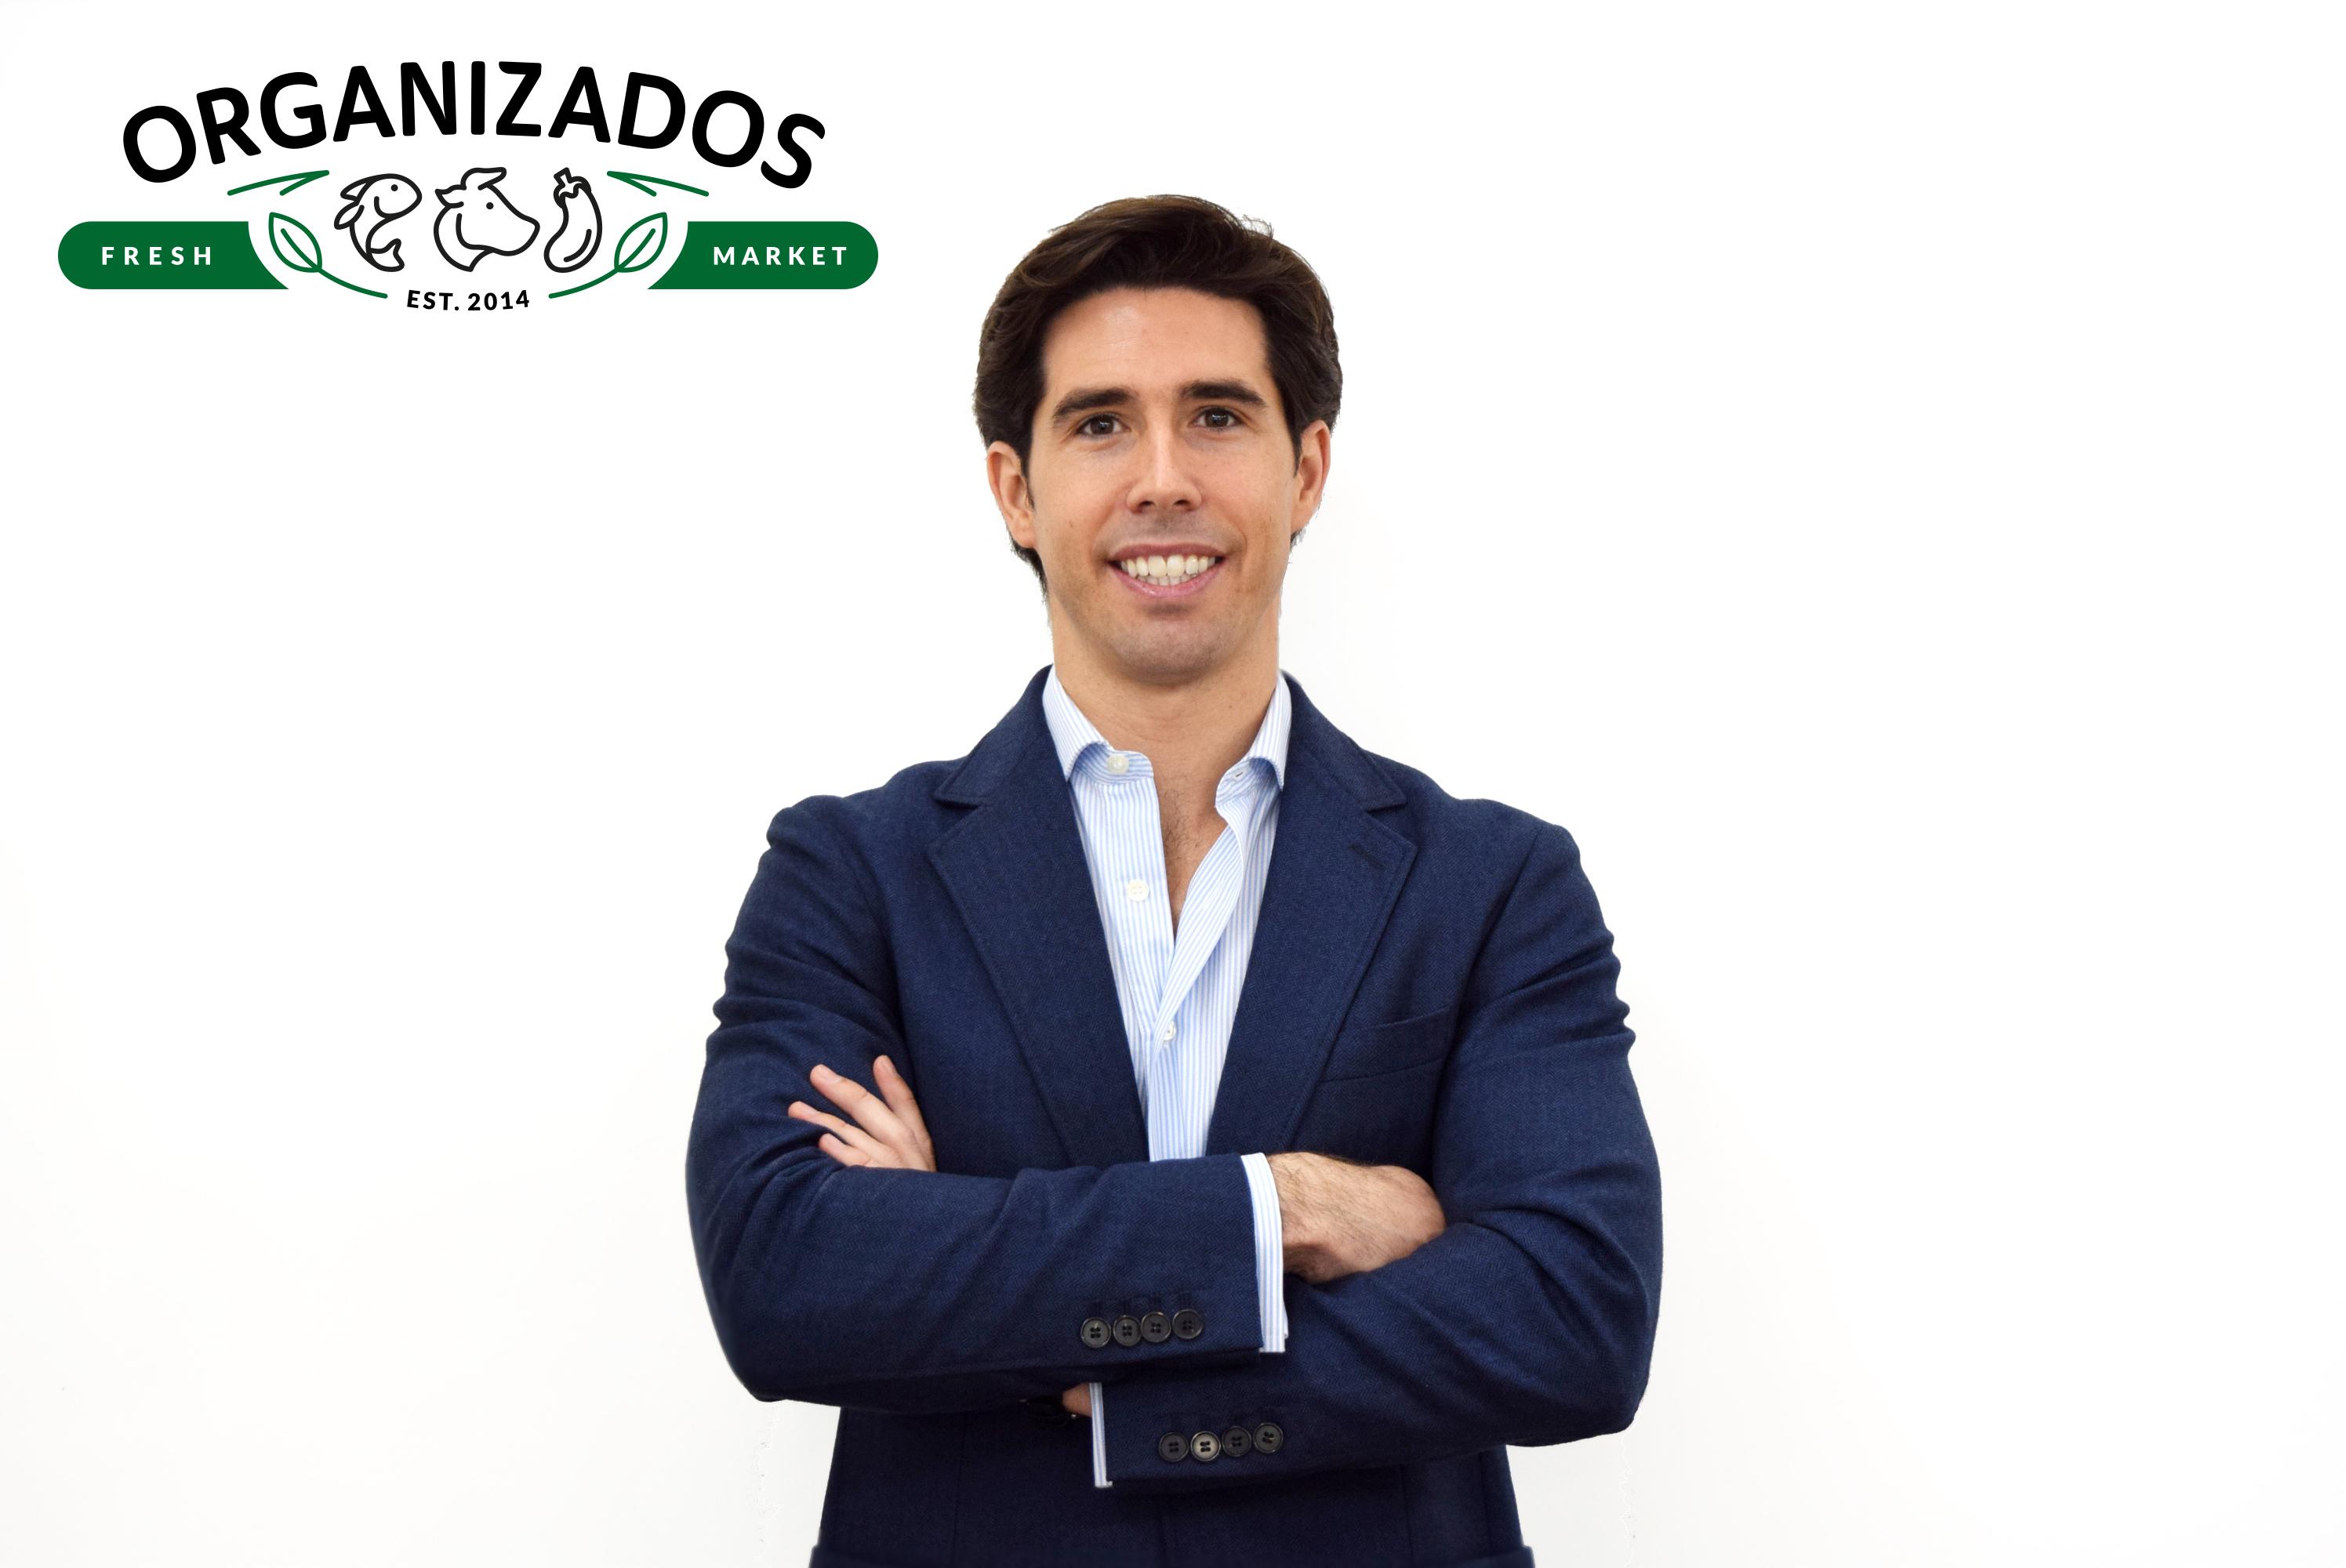 Carlos Sánchez Ramade